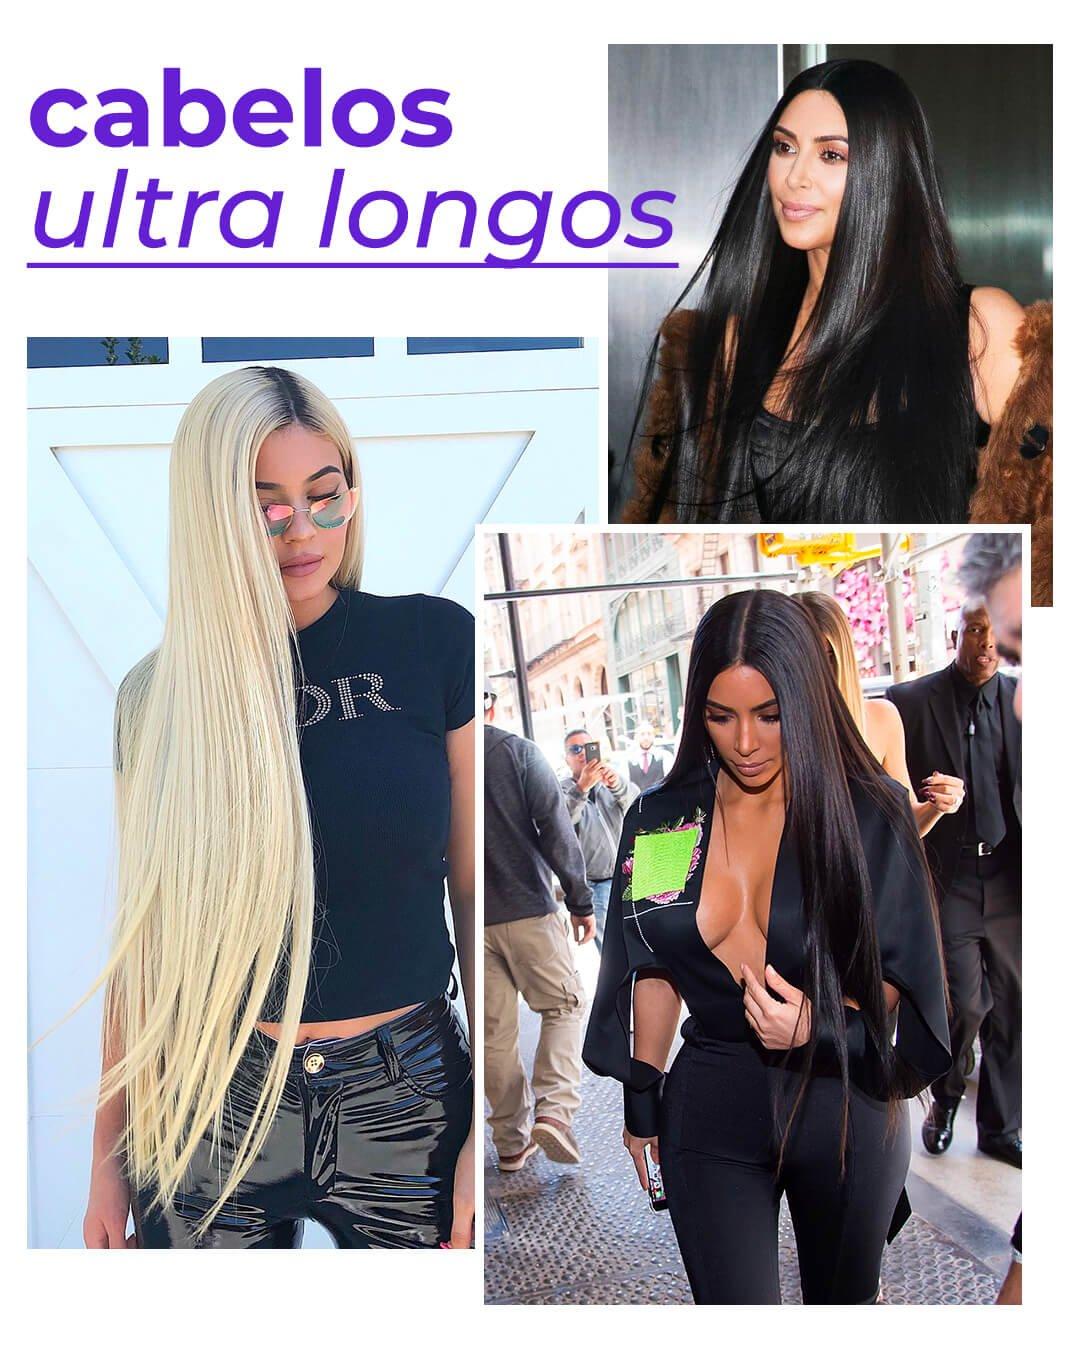 It girls - Cabelos longos - Kardashians - Verão - Street Style - https://stealthelook.com.br